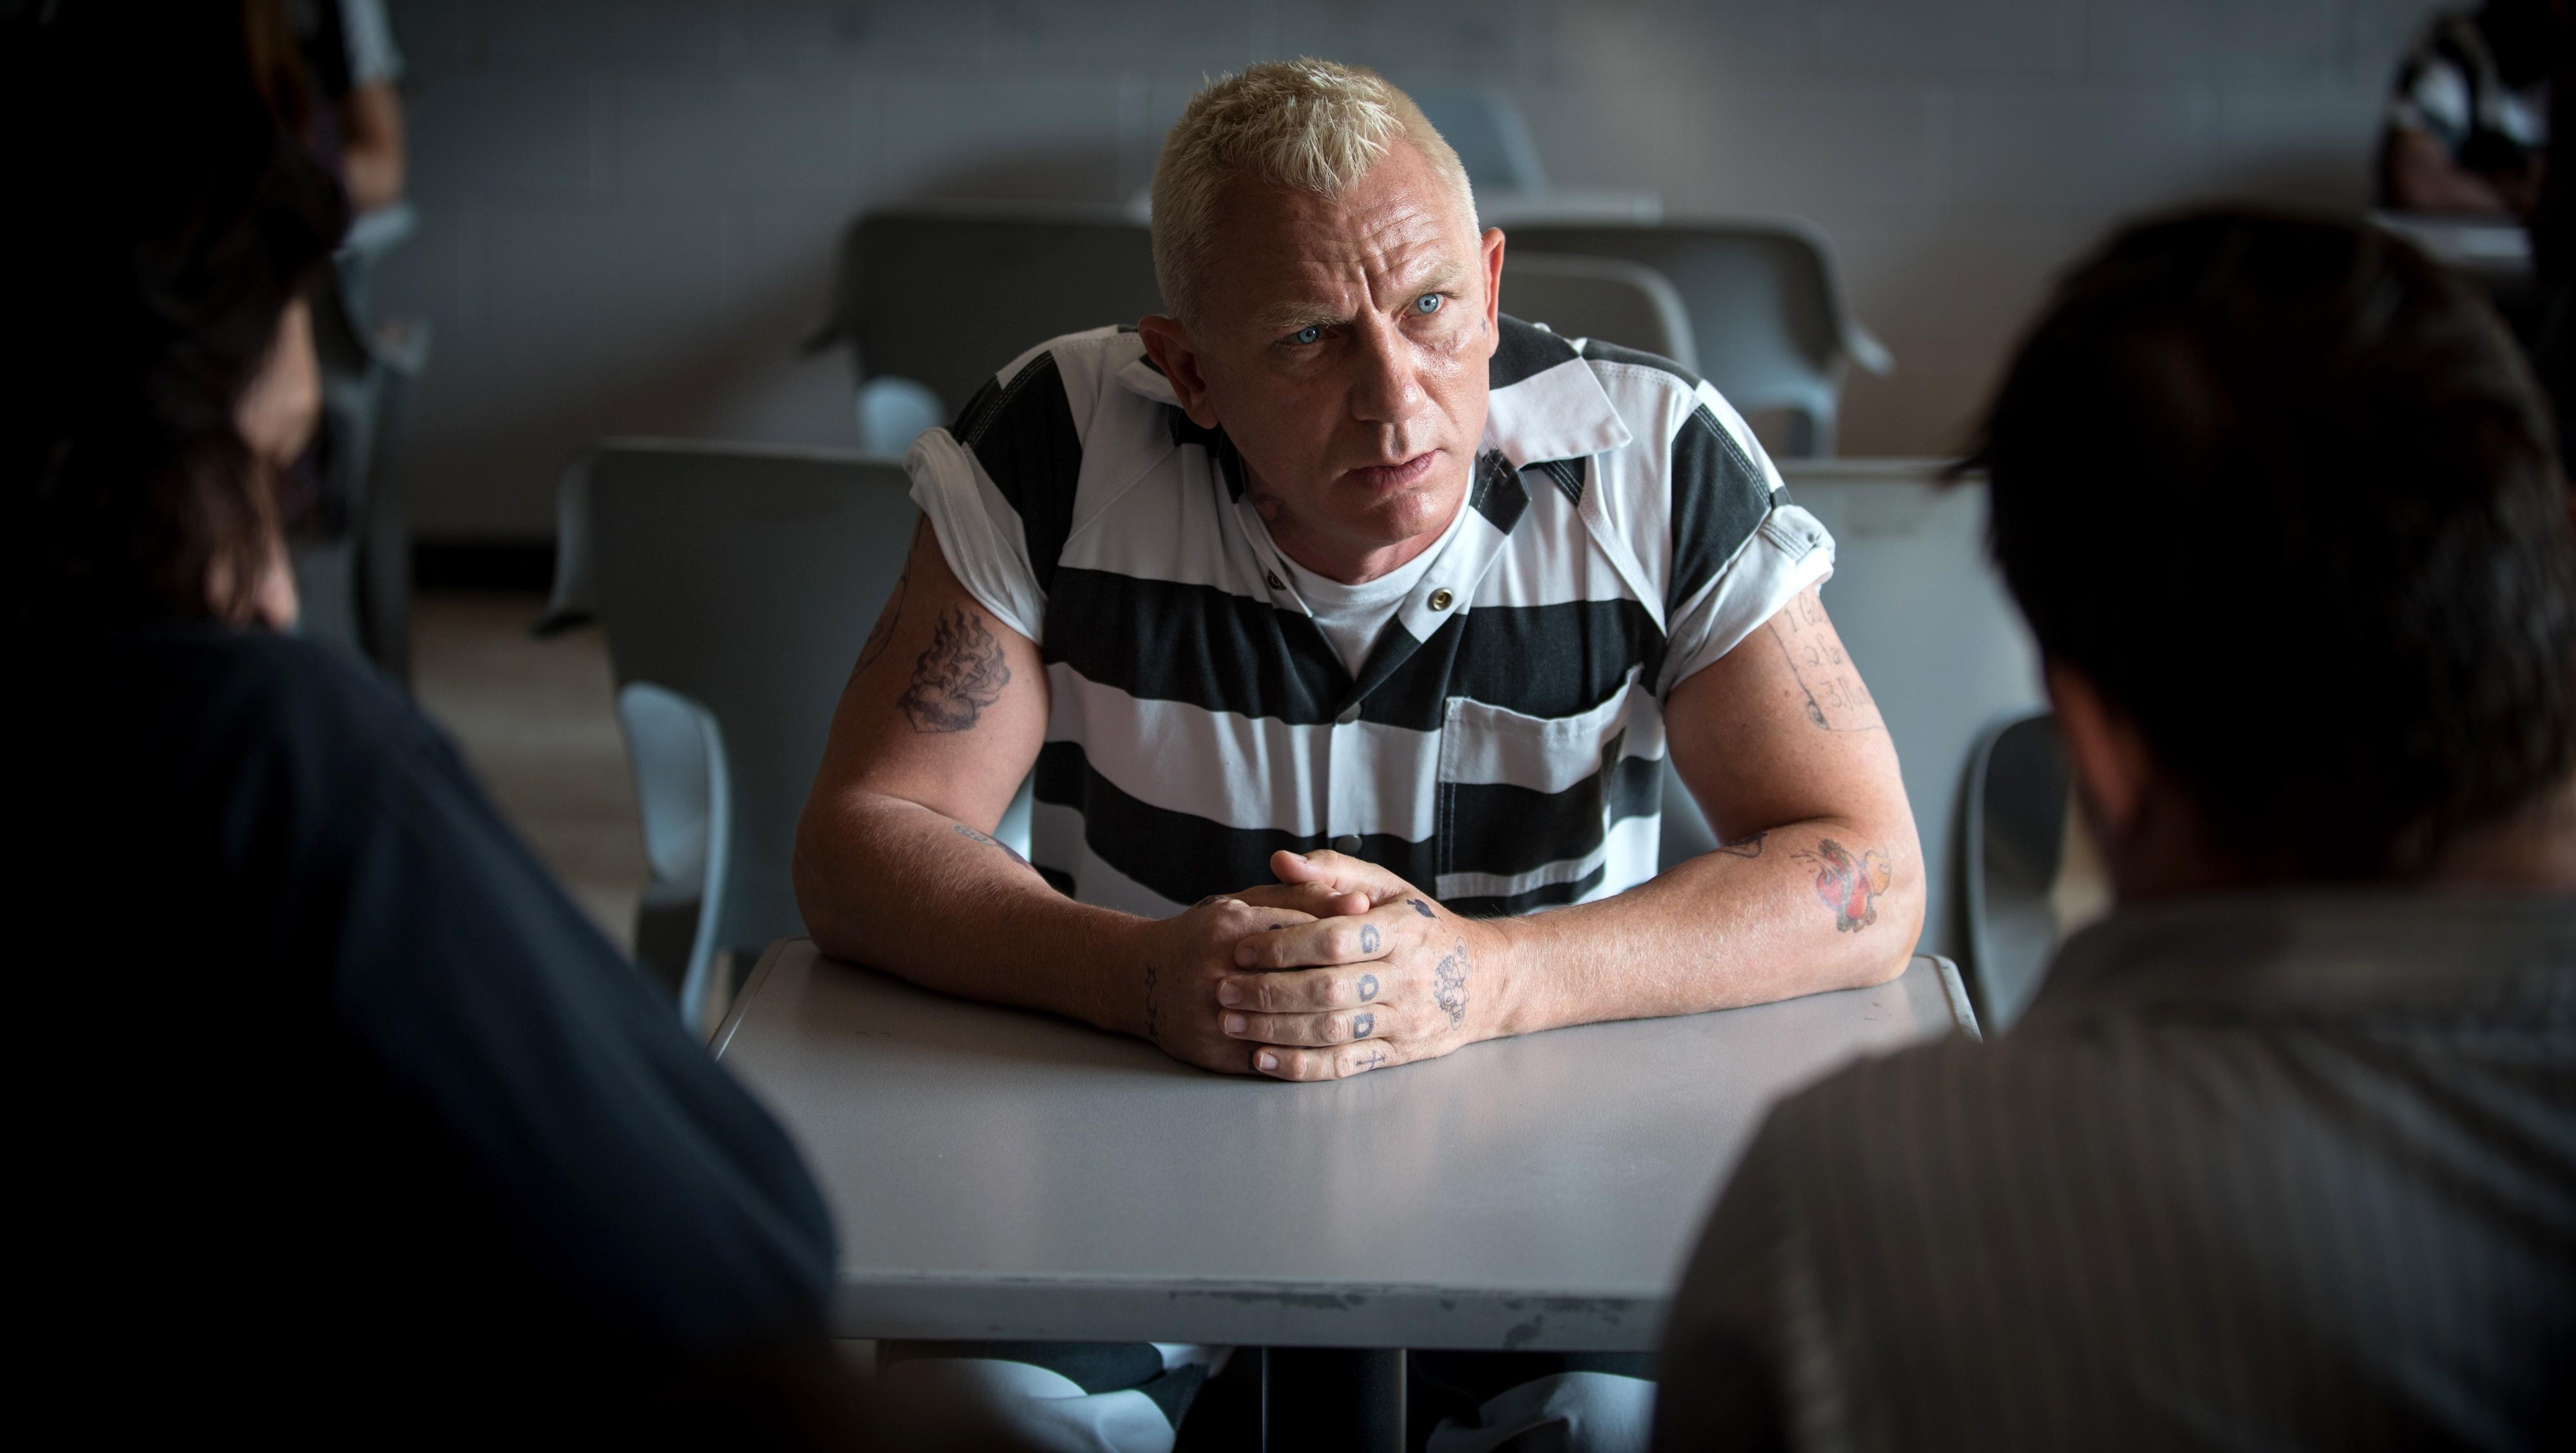 Review: Heist almighty! Craig steals 'Logan Lucky'